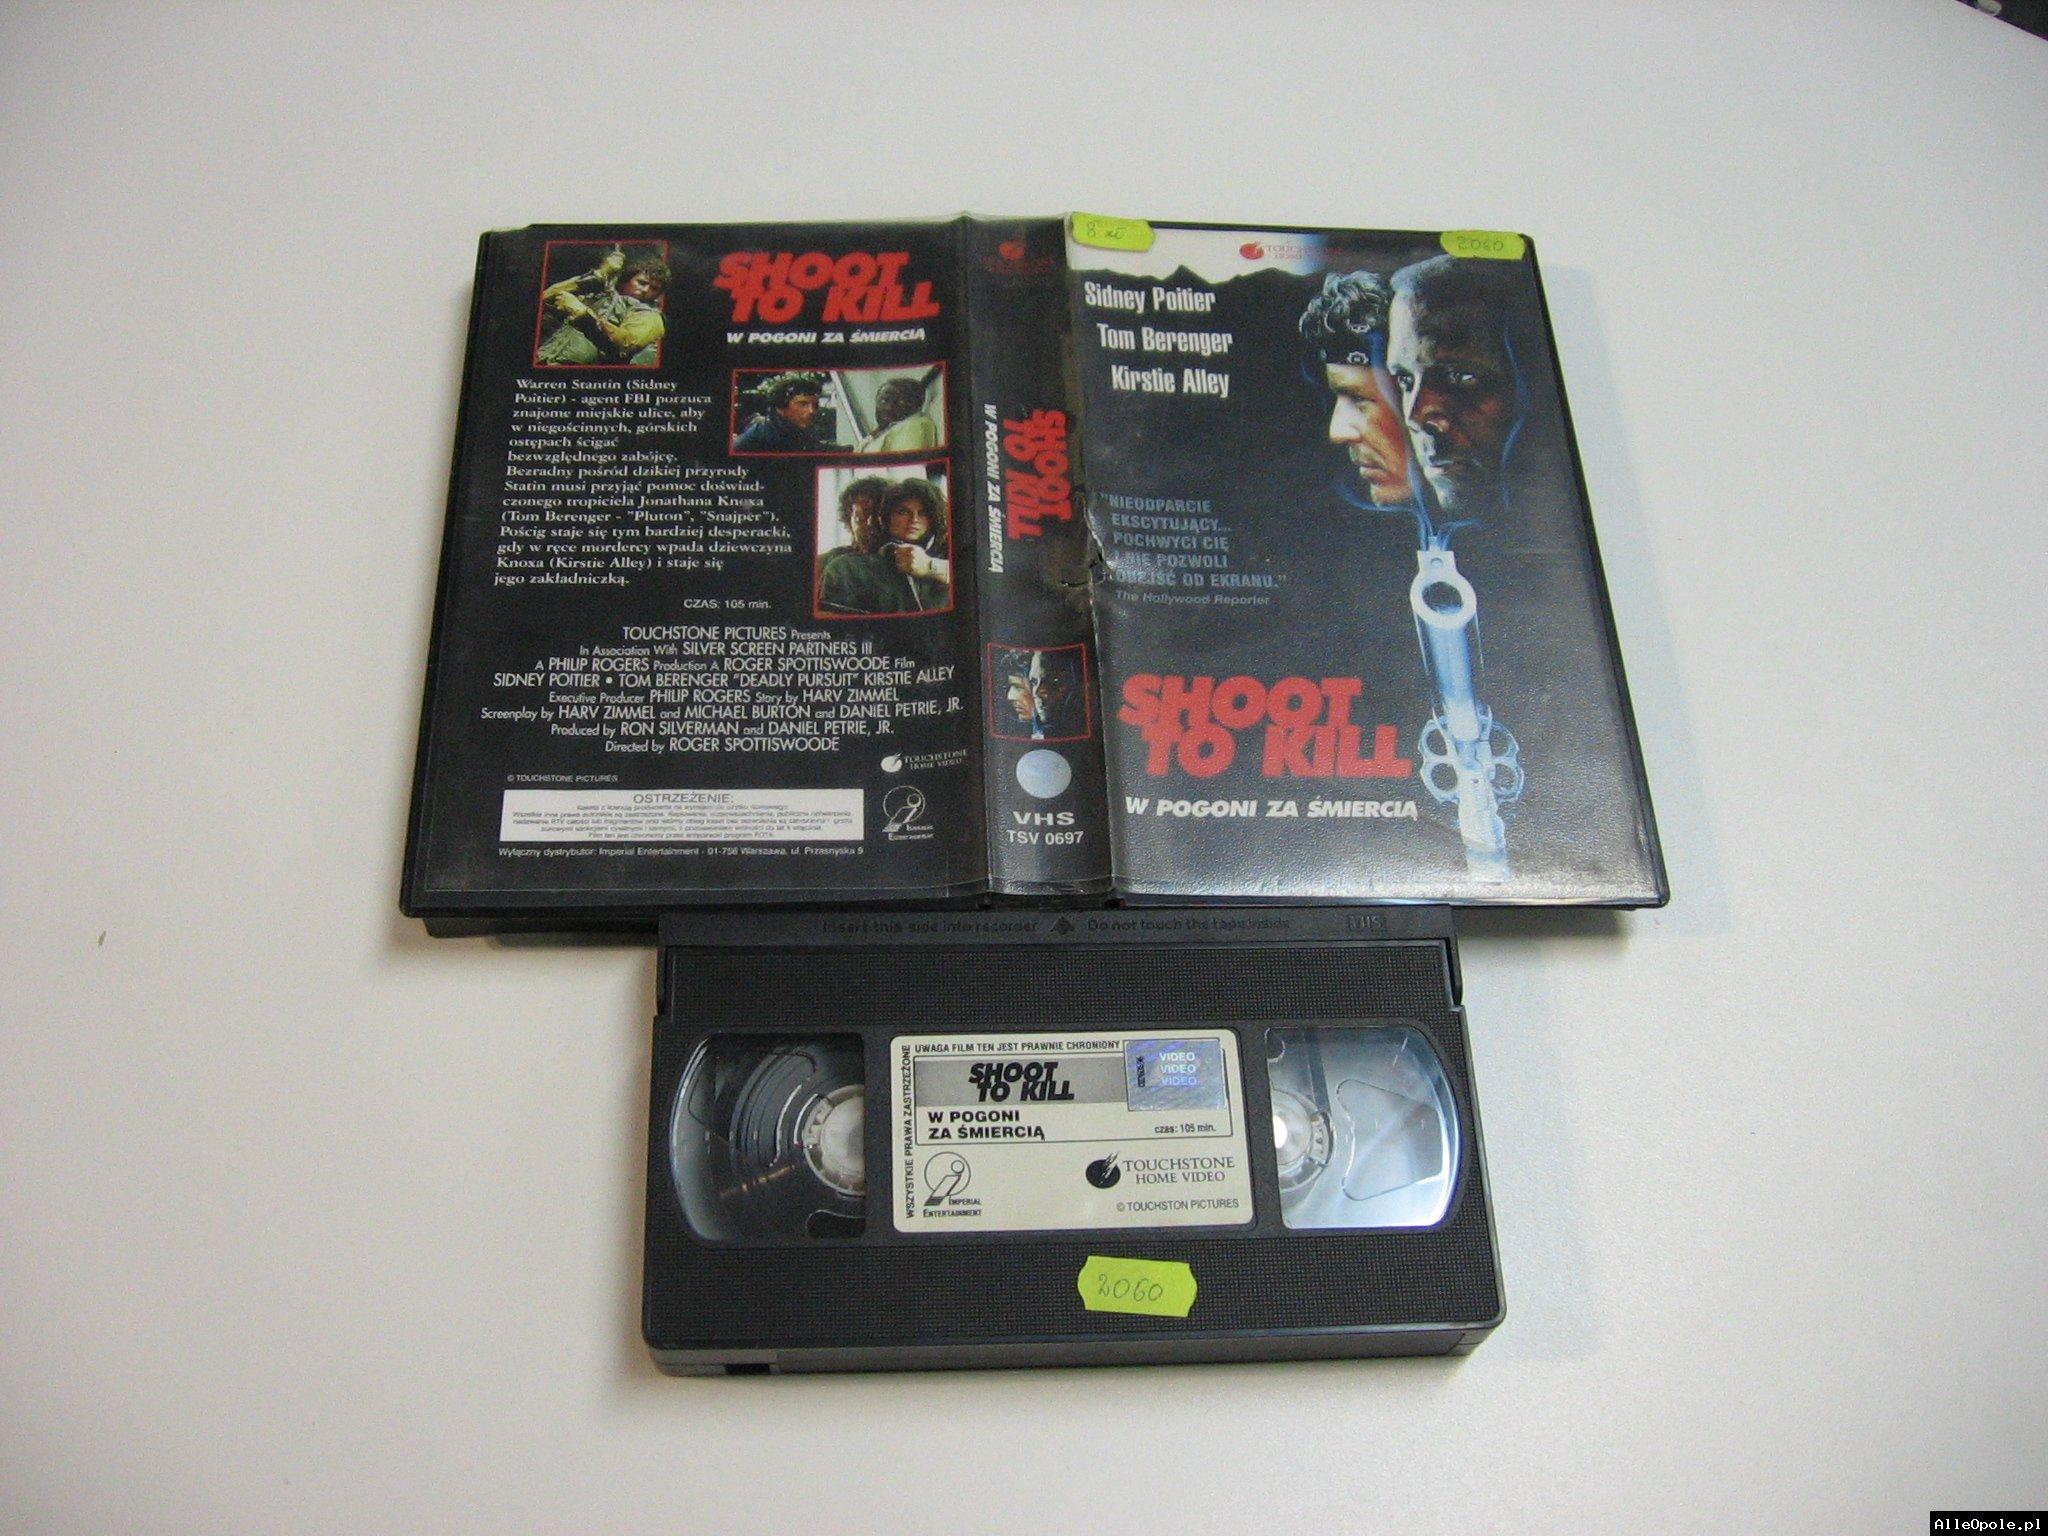 W POGONI ZA ŚMIERCIĄ - VHS Kaseta Video - Opole 1814